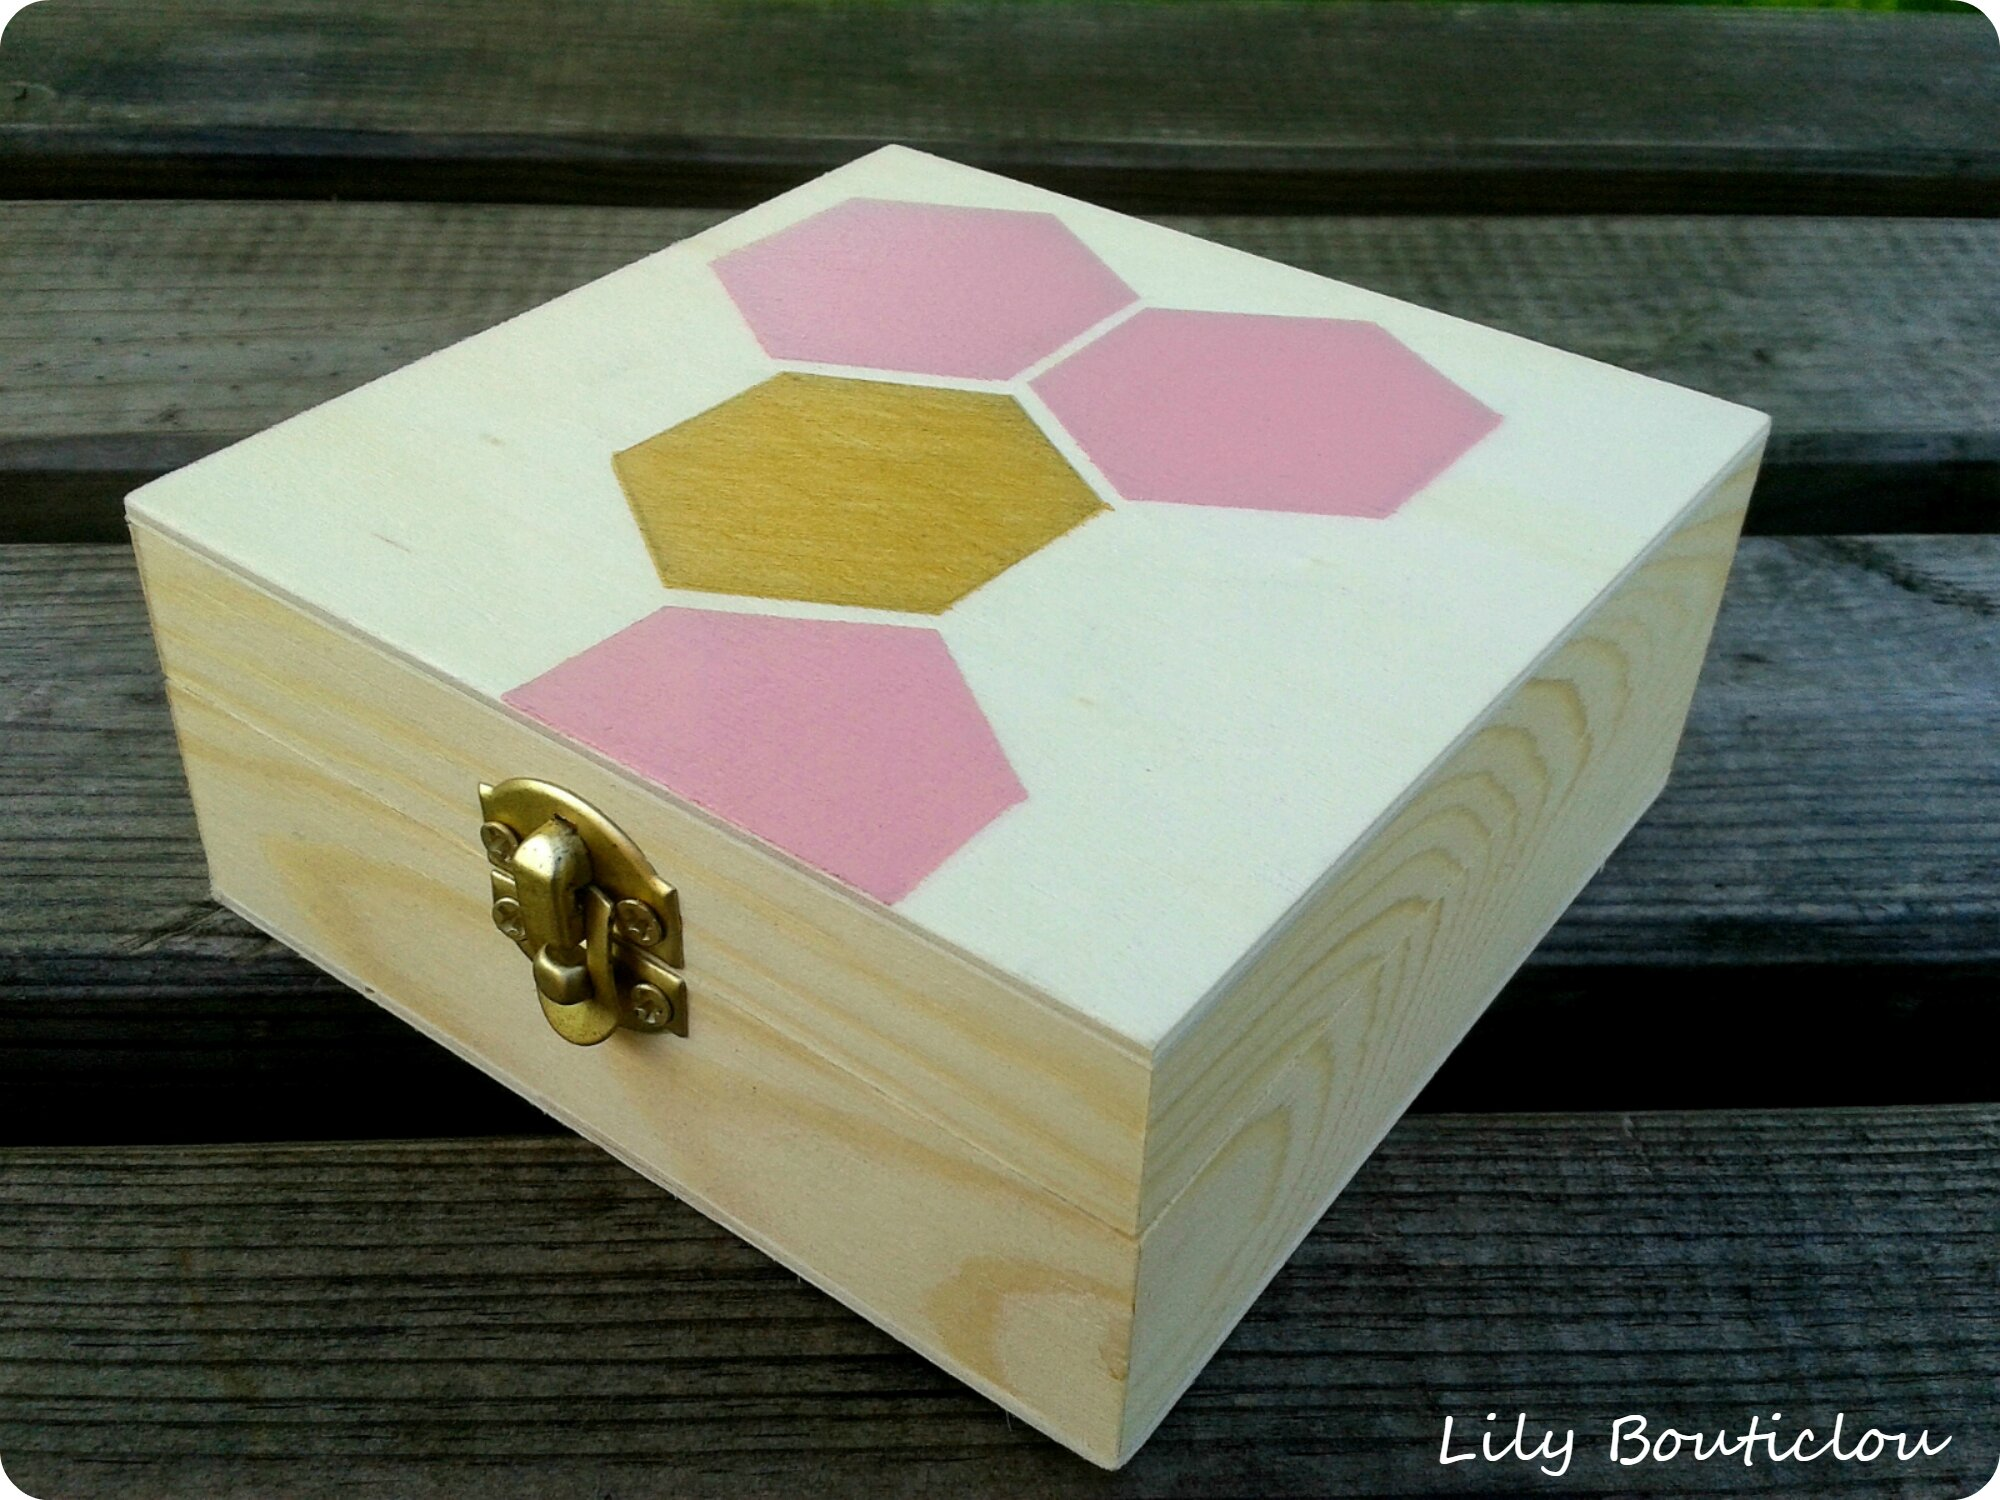 comment customiser une boite en bois. Black Bedroom Furniture Sets. Home Design Ideas